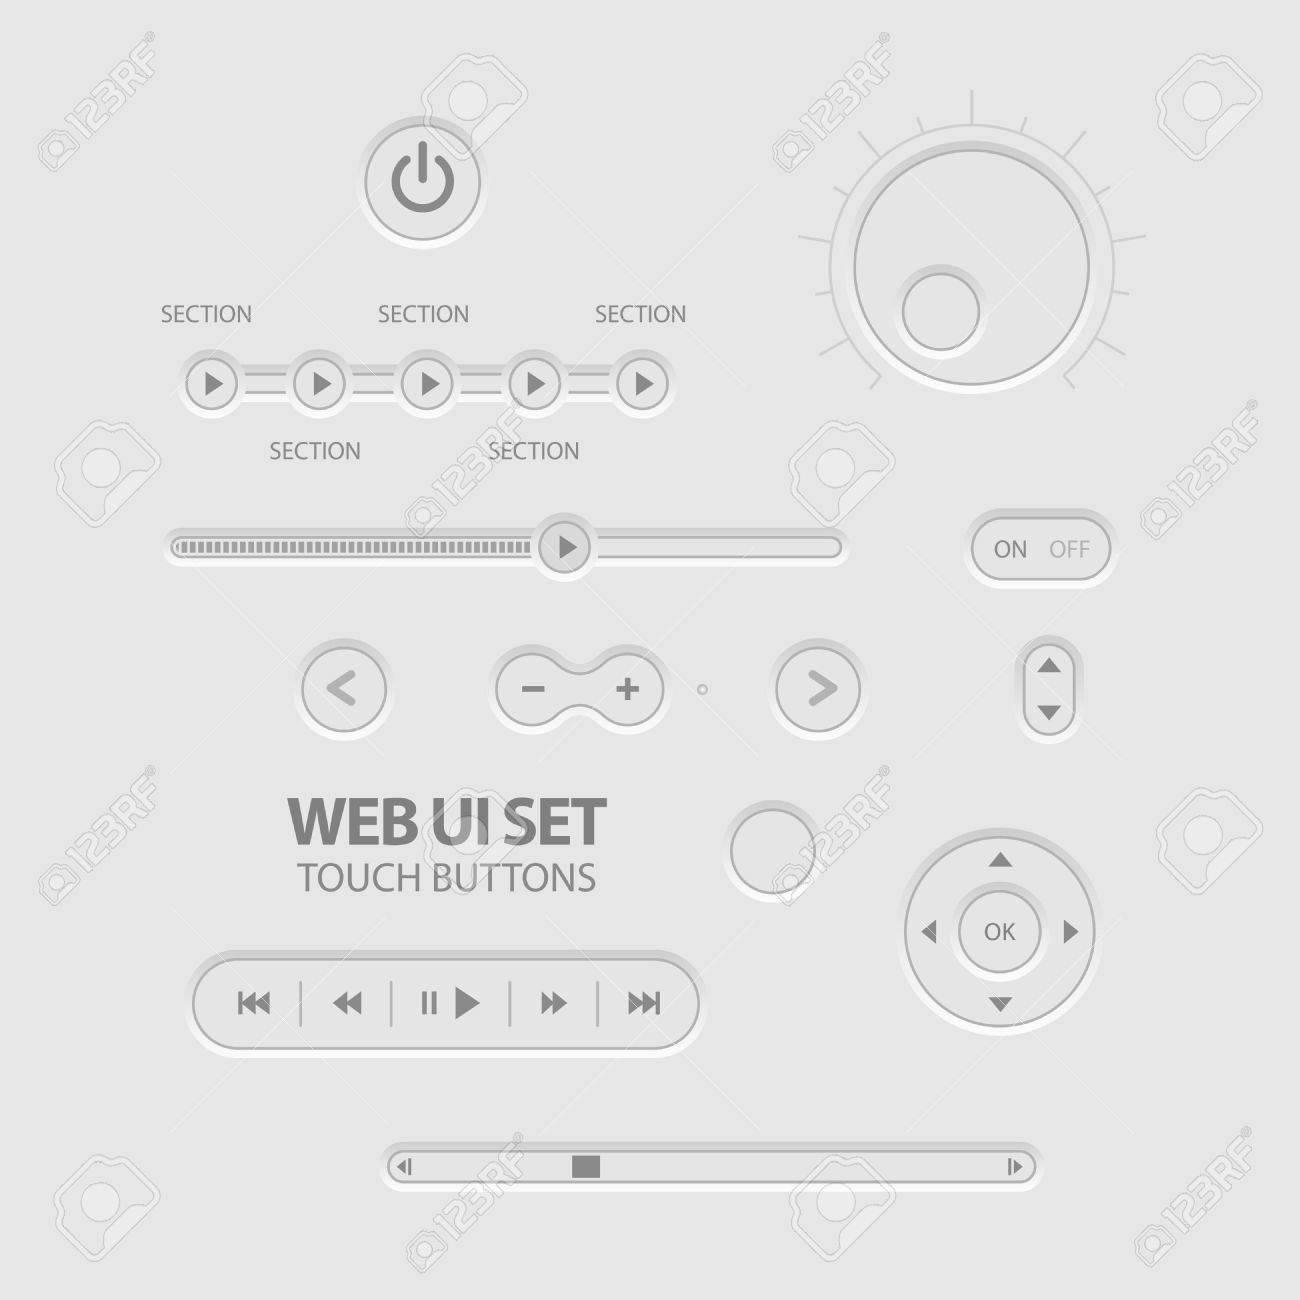 Light Web UI Elements Design Gray Stock Vector - 13306887